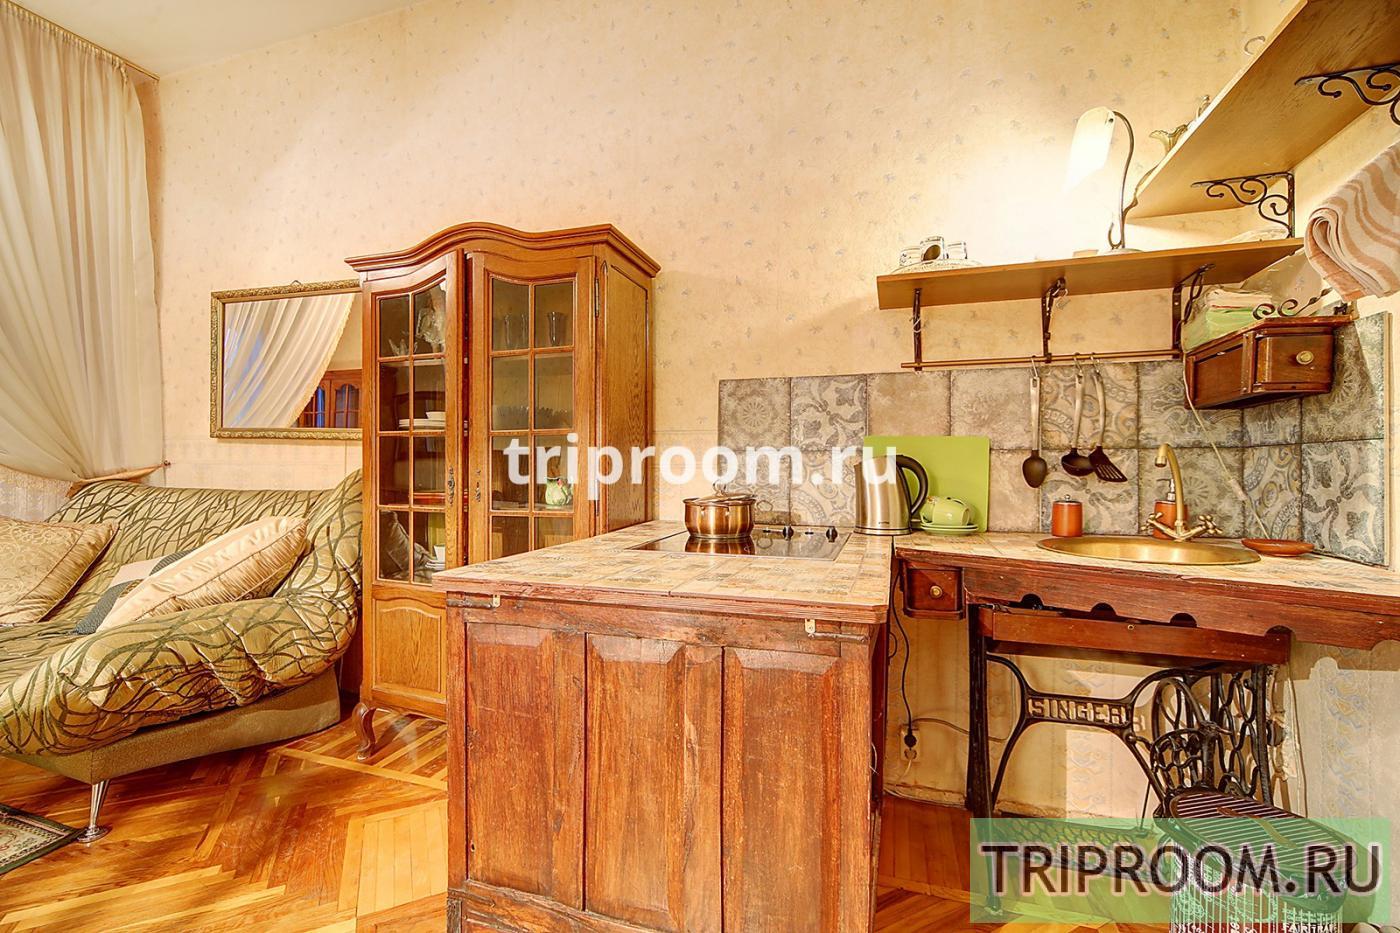 1-комнатная квартира посуточно (вариант № 15445), ул. Лиговский проспект, фото № 12